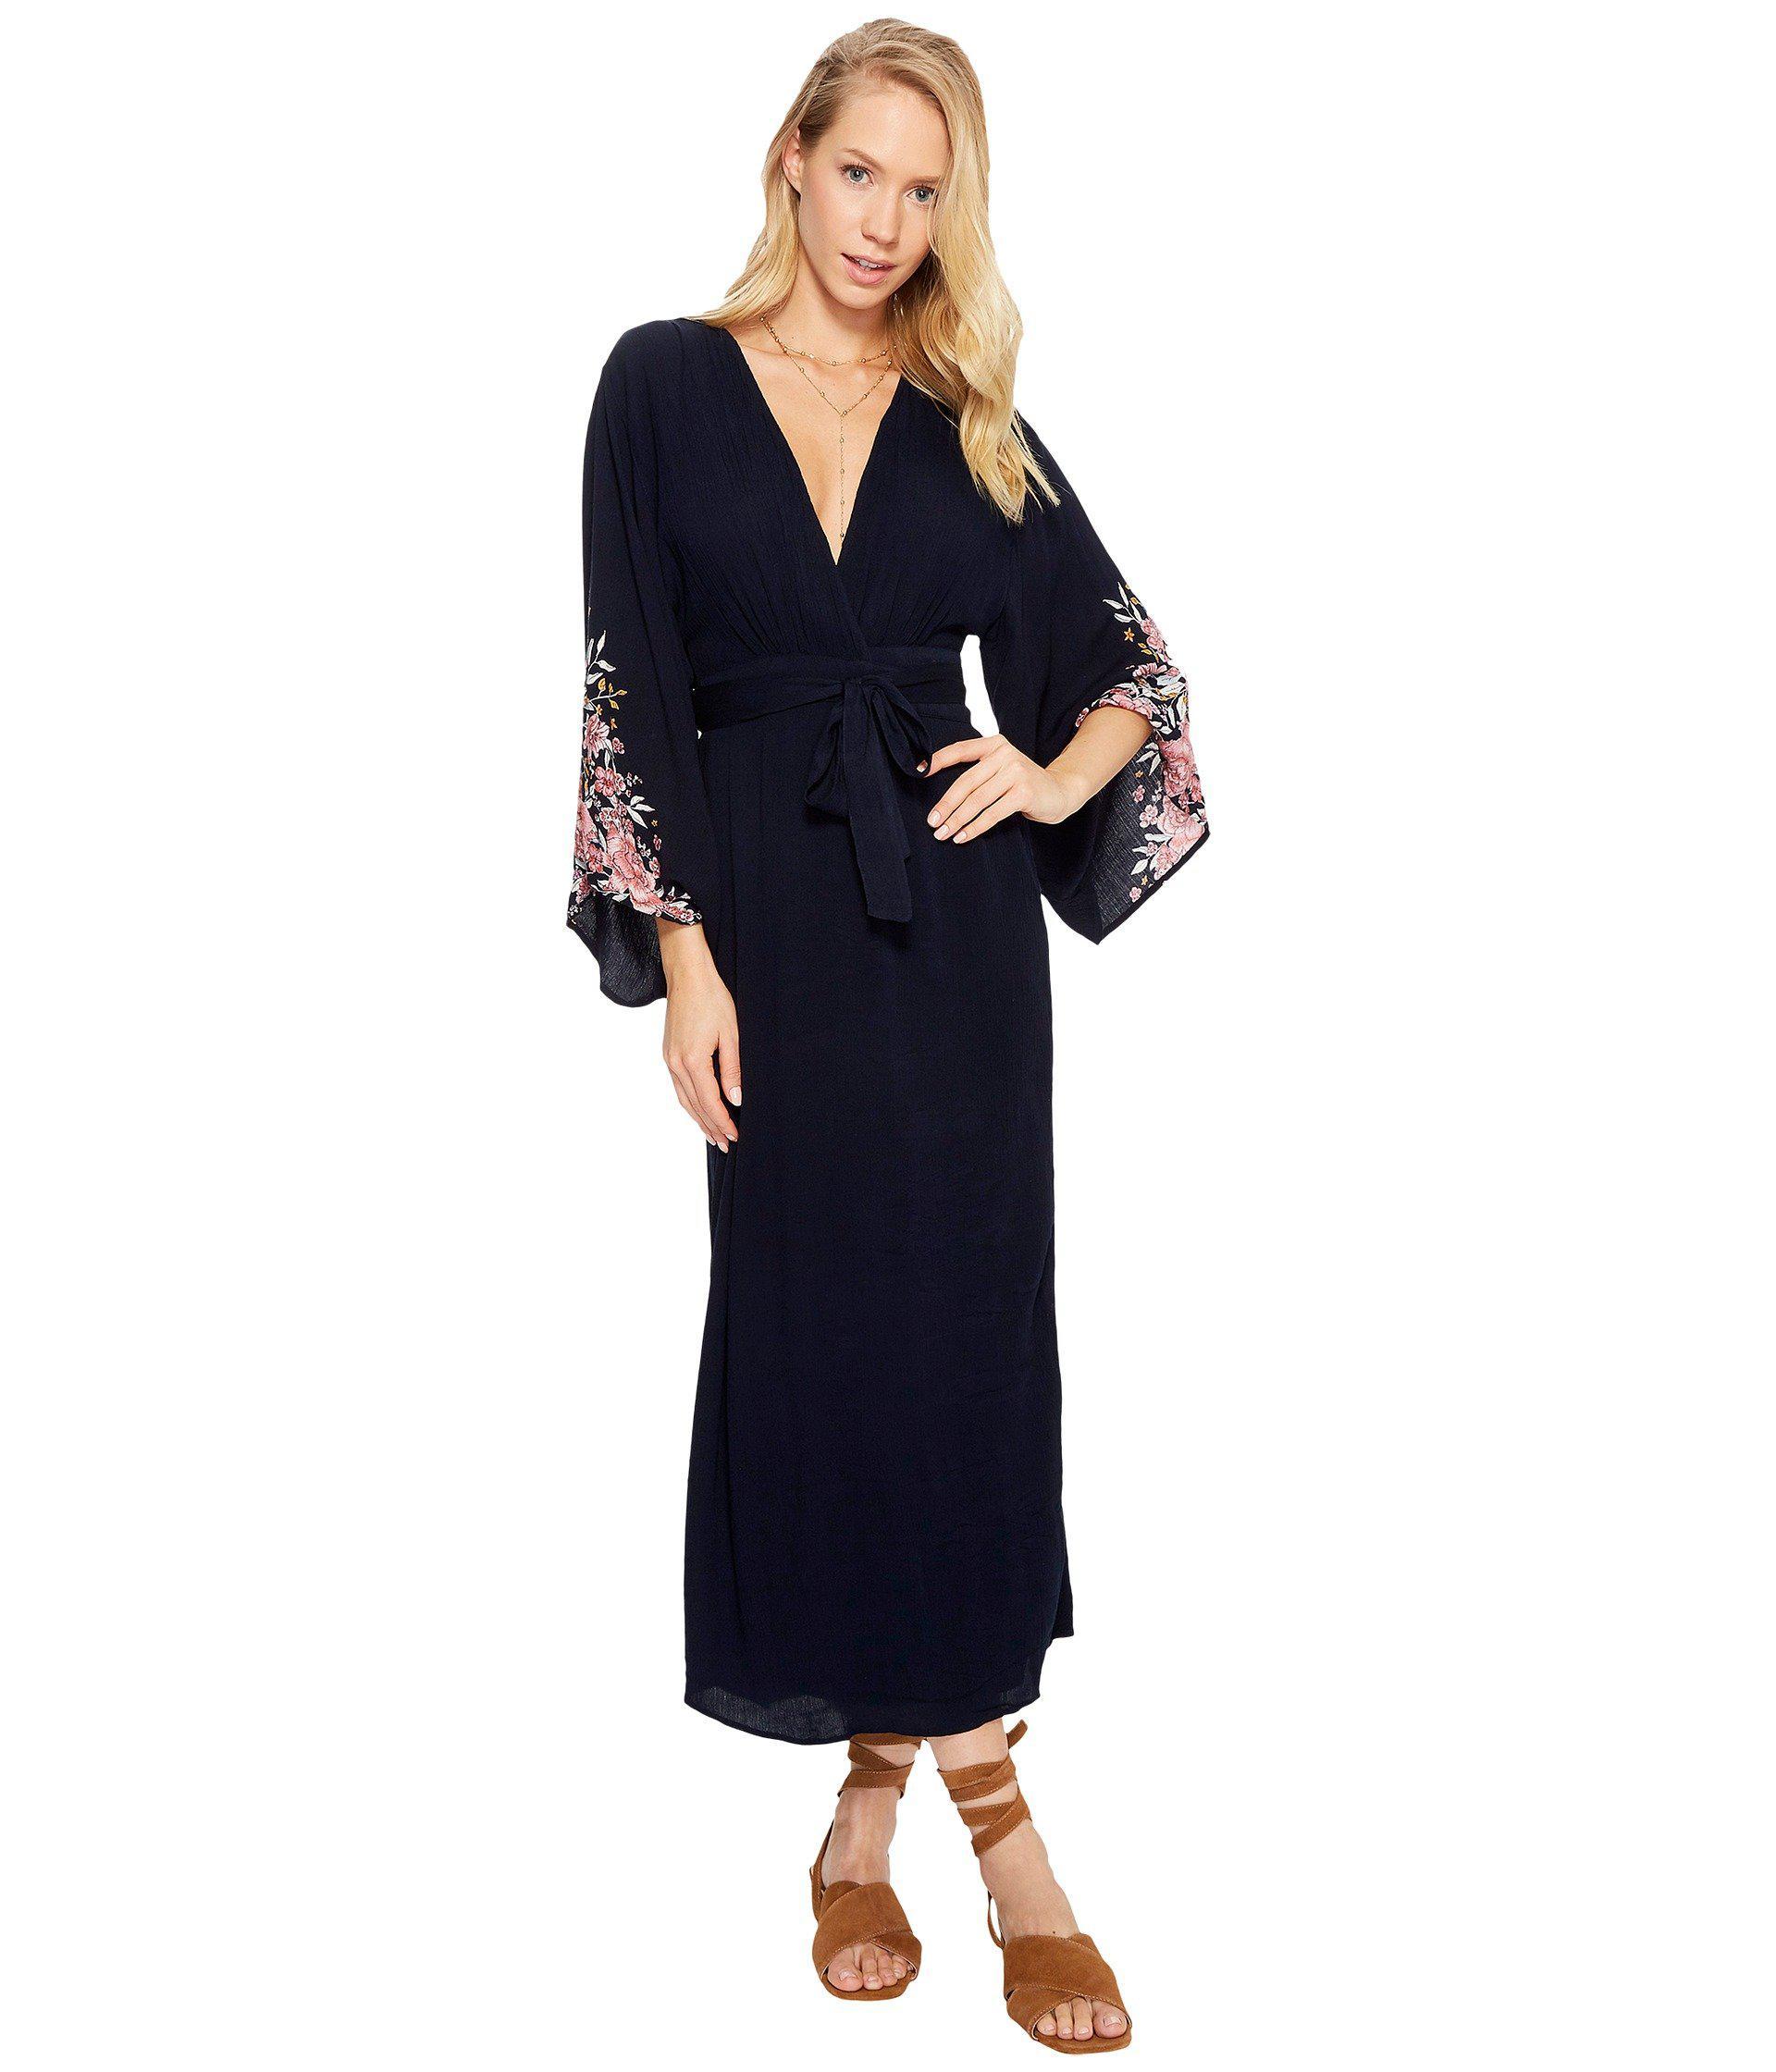 c6b9822740367 Lyst - Billabong Robe Life Dress in Blue